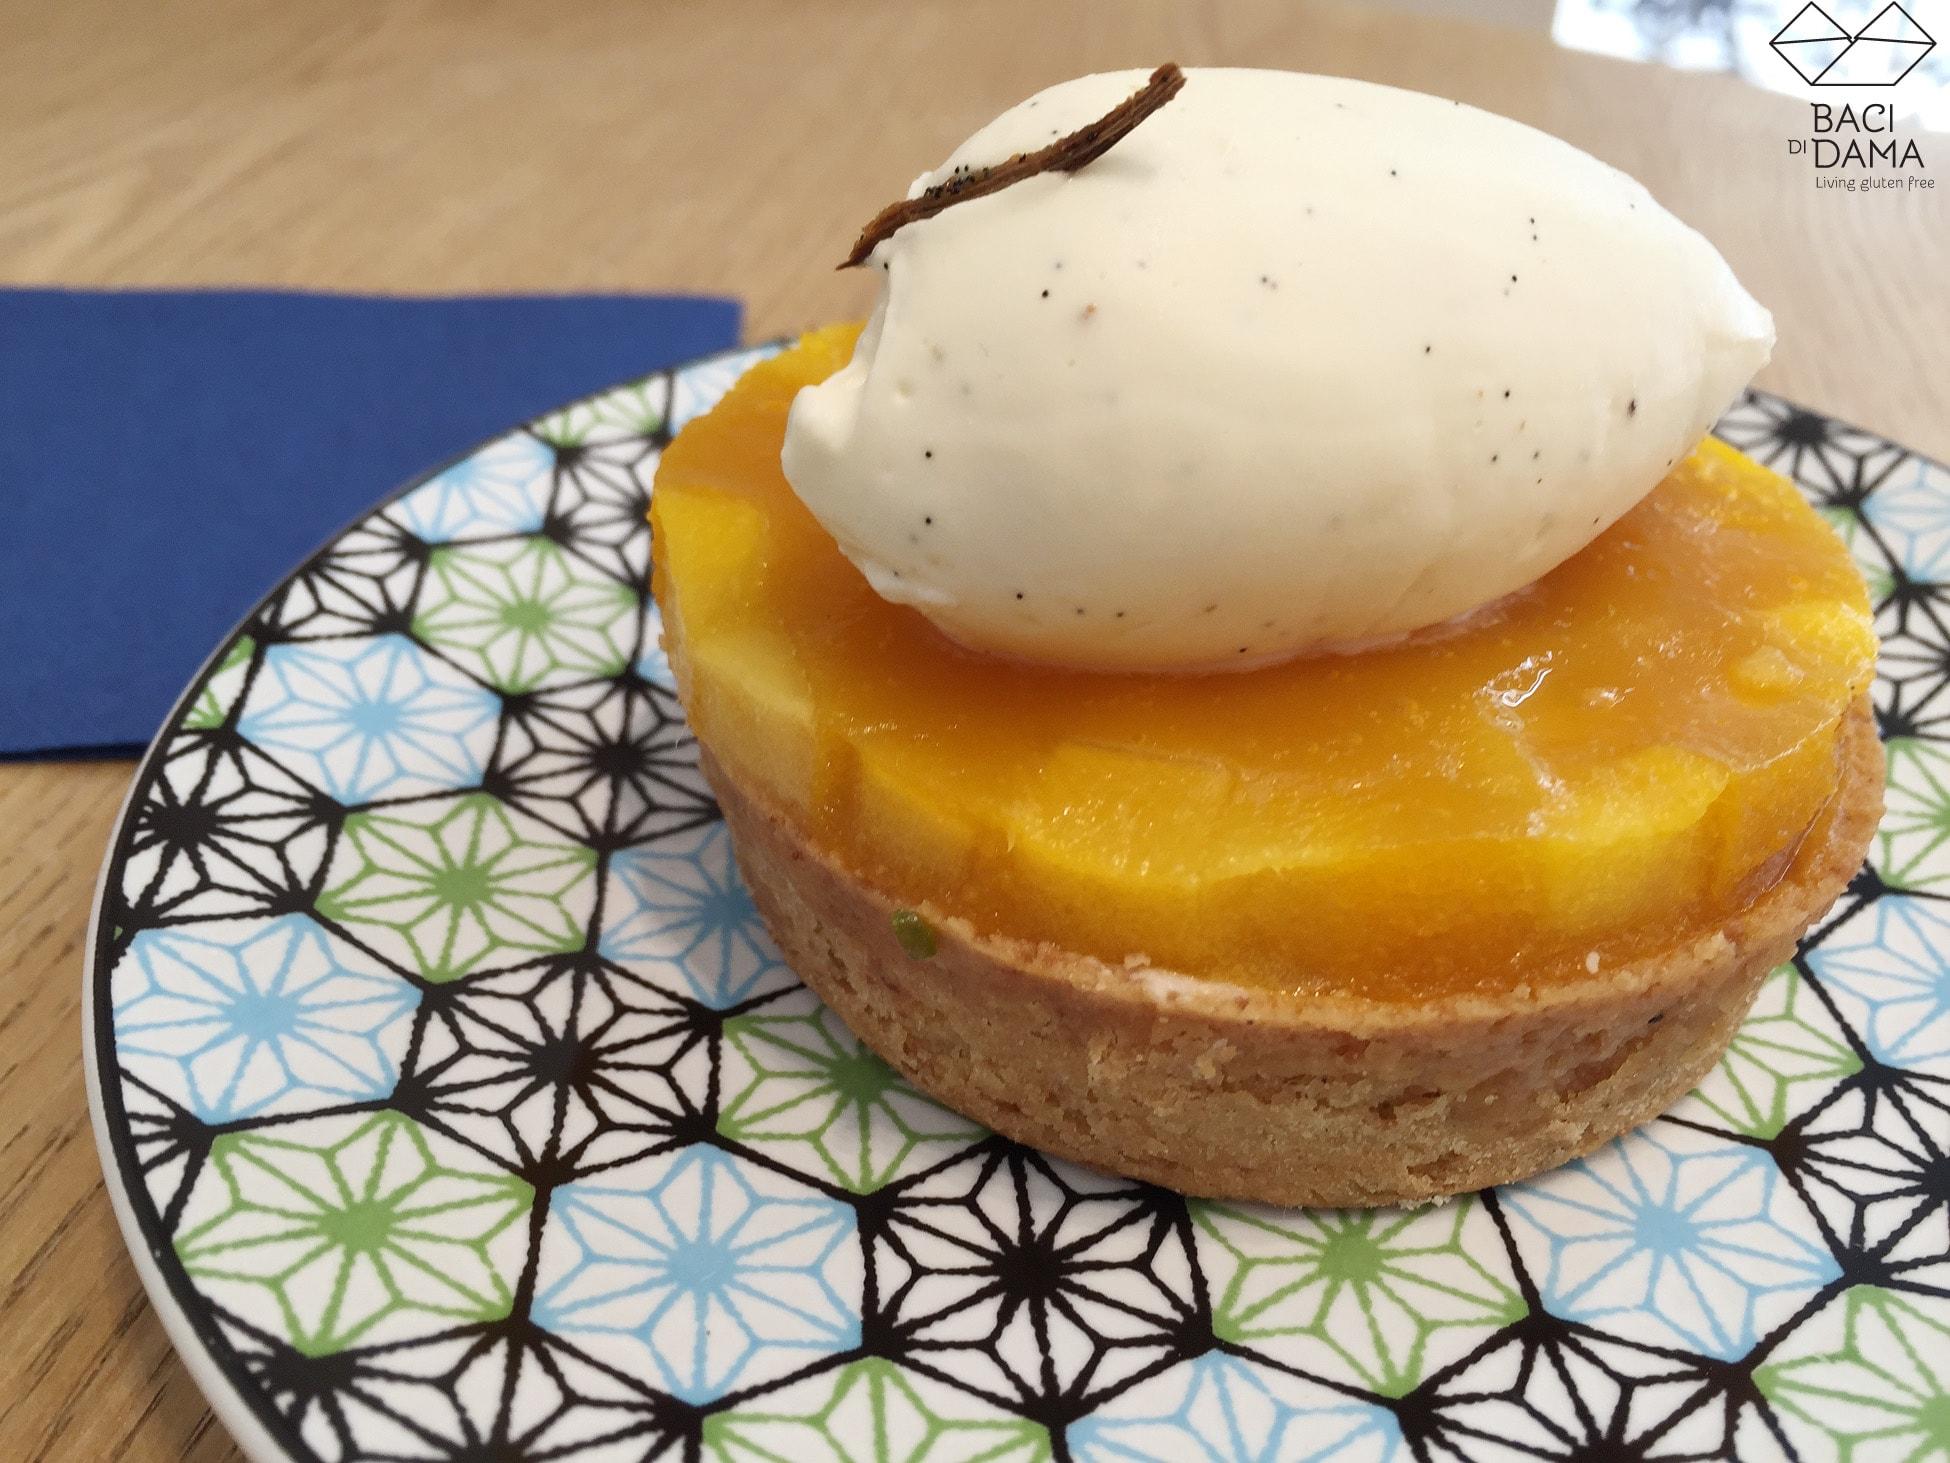 Helmut Newcake gluten free pastry shop: yummy gluten free pineapple vanilla tart